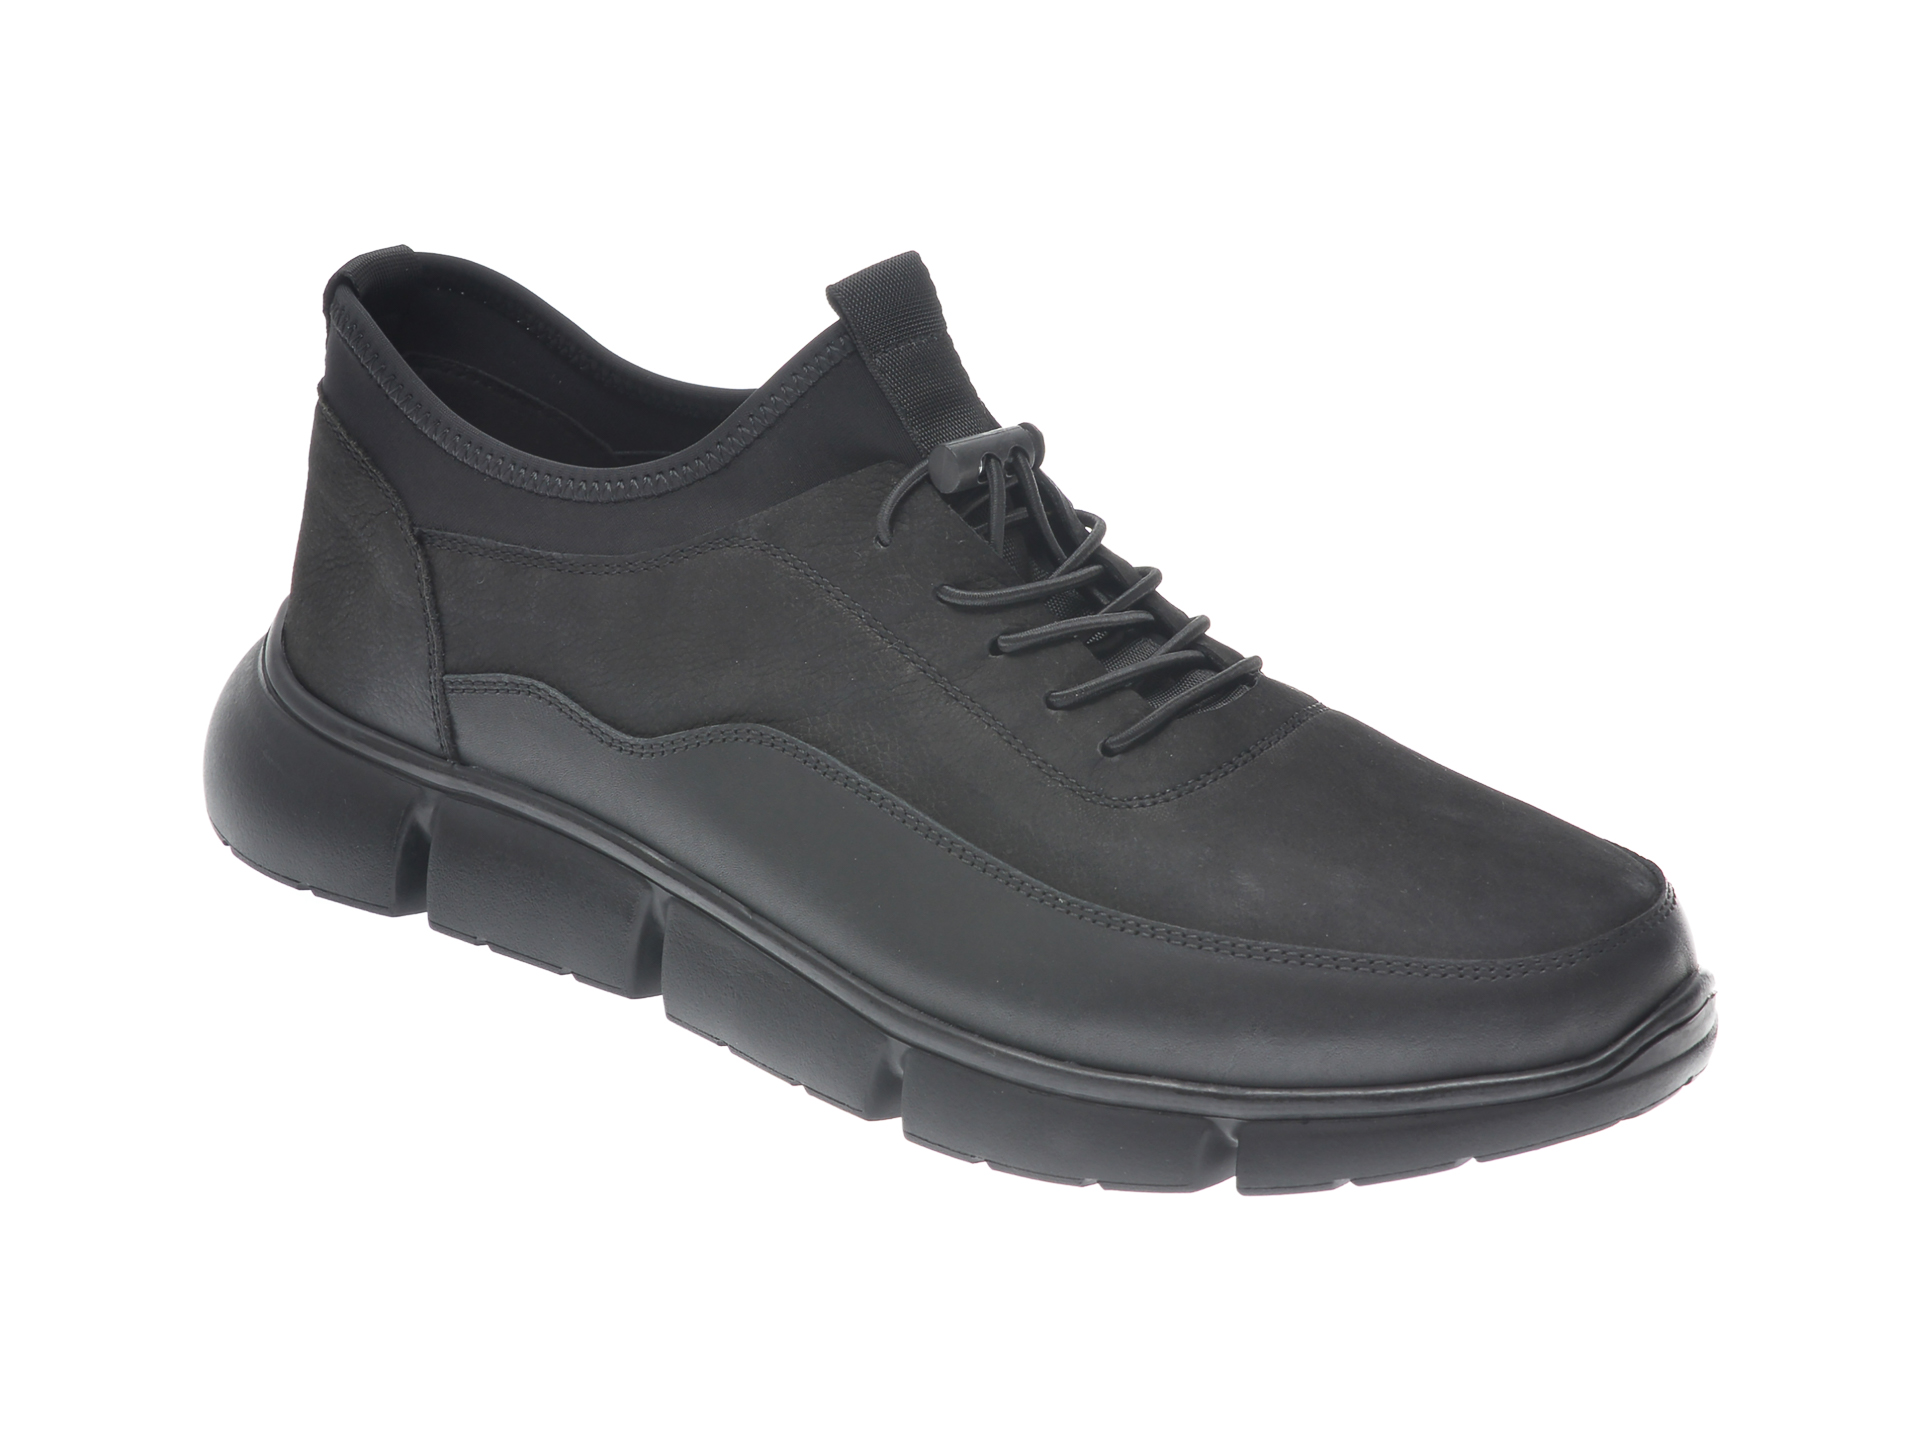 Pantofi OTTER negri, S0761819, din piele naturala New